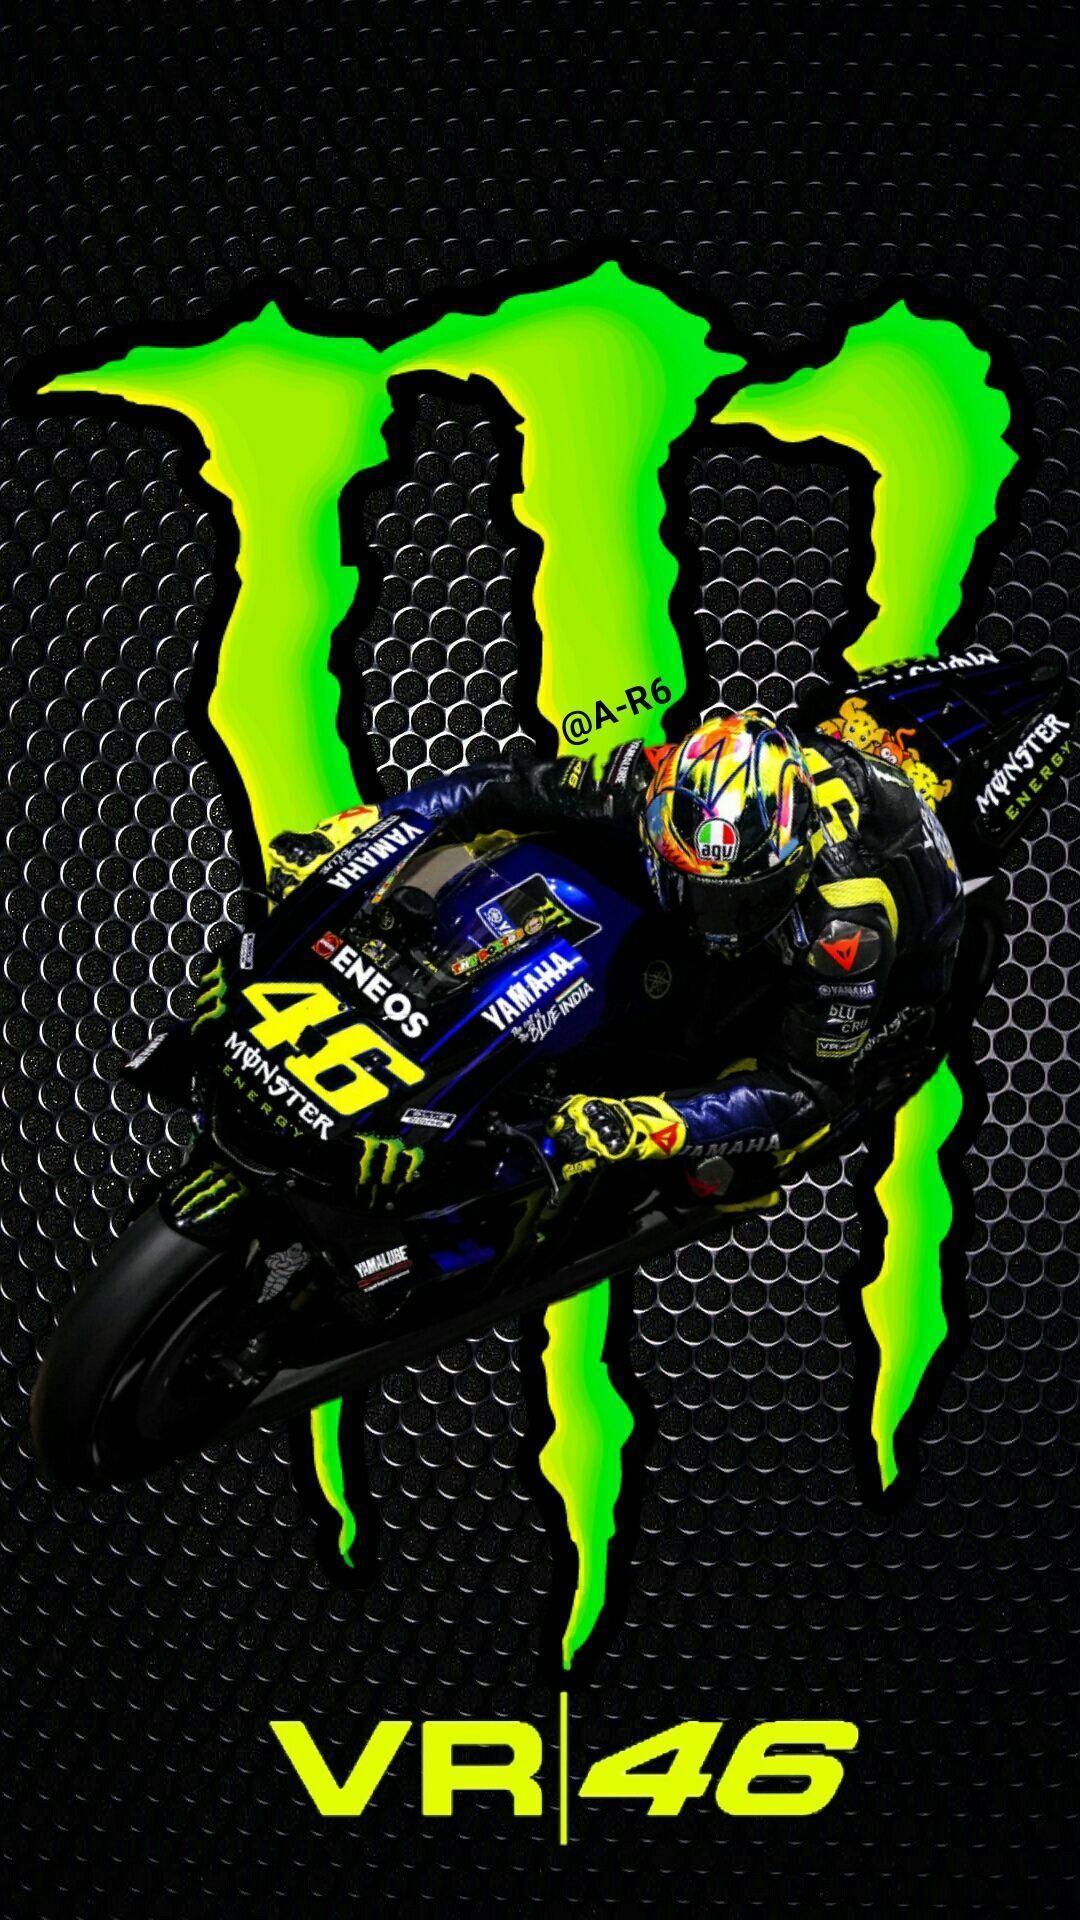 Valentino Rossi VR46 Monster energy 2019 Cars and Motorcycles Blog en 2020 | Fond ecran moto ...